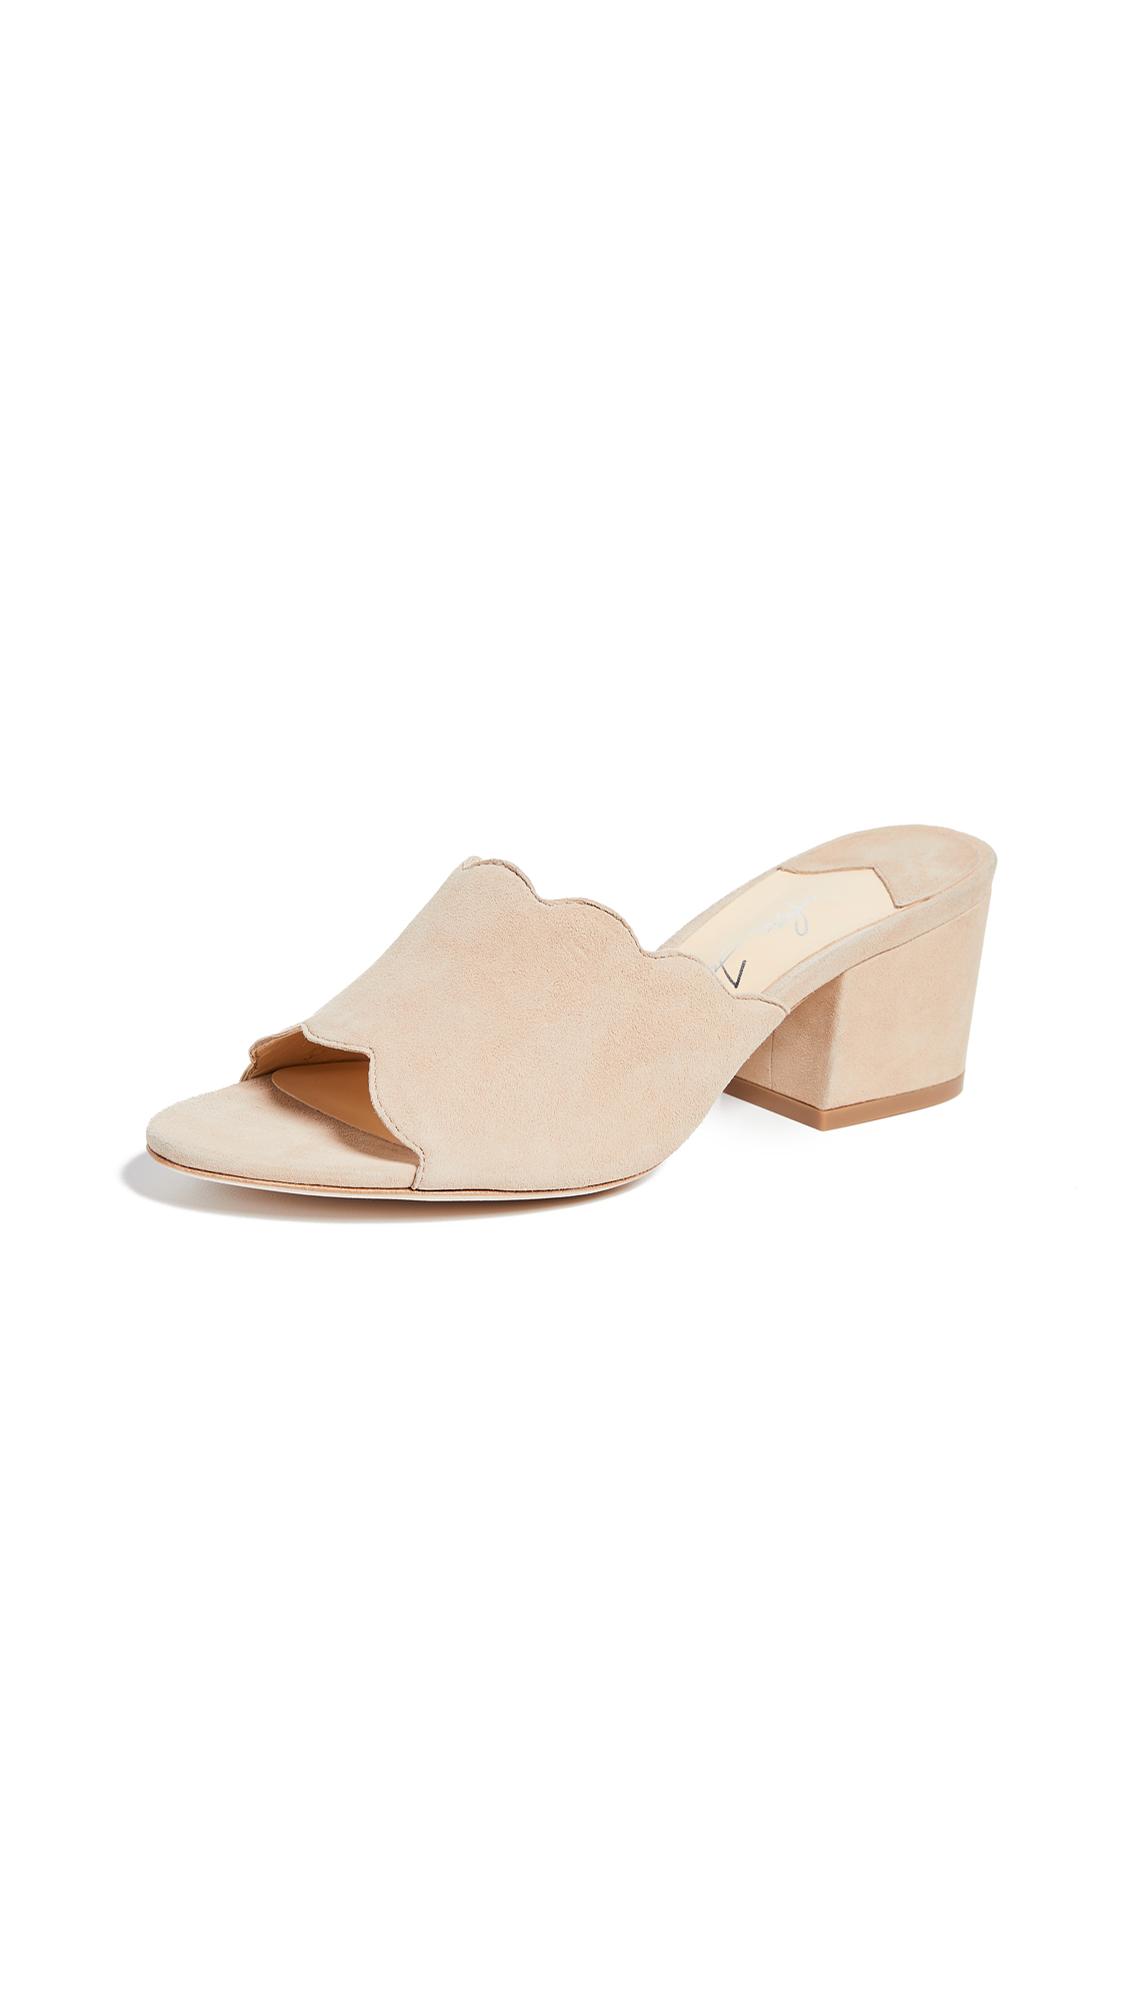 Isa Tapia Chiqui Scalloped Block Heel Slides - Suntan